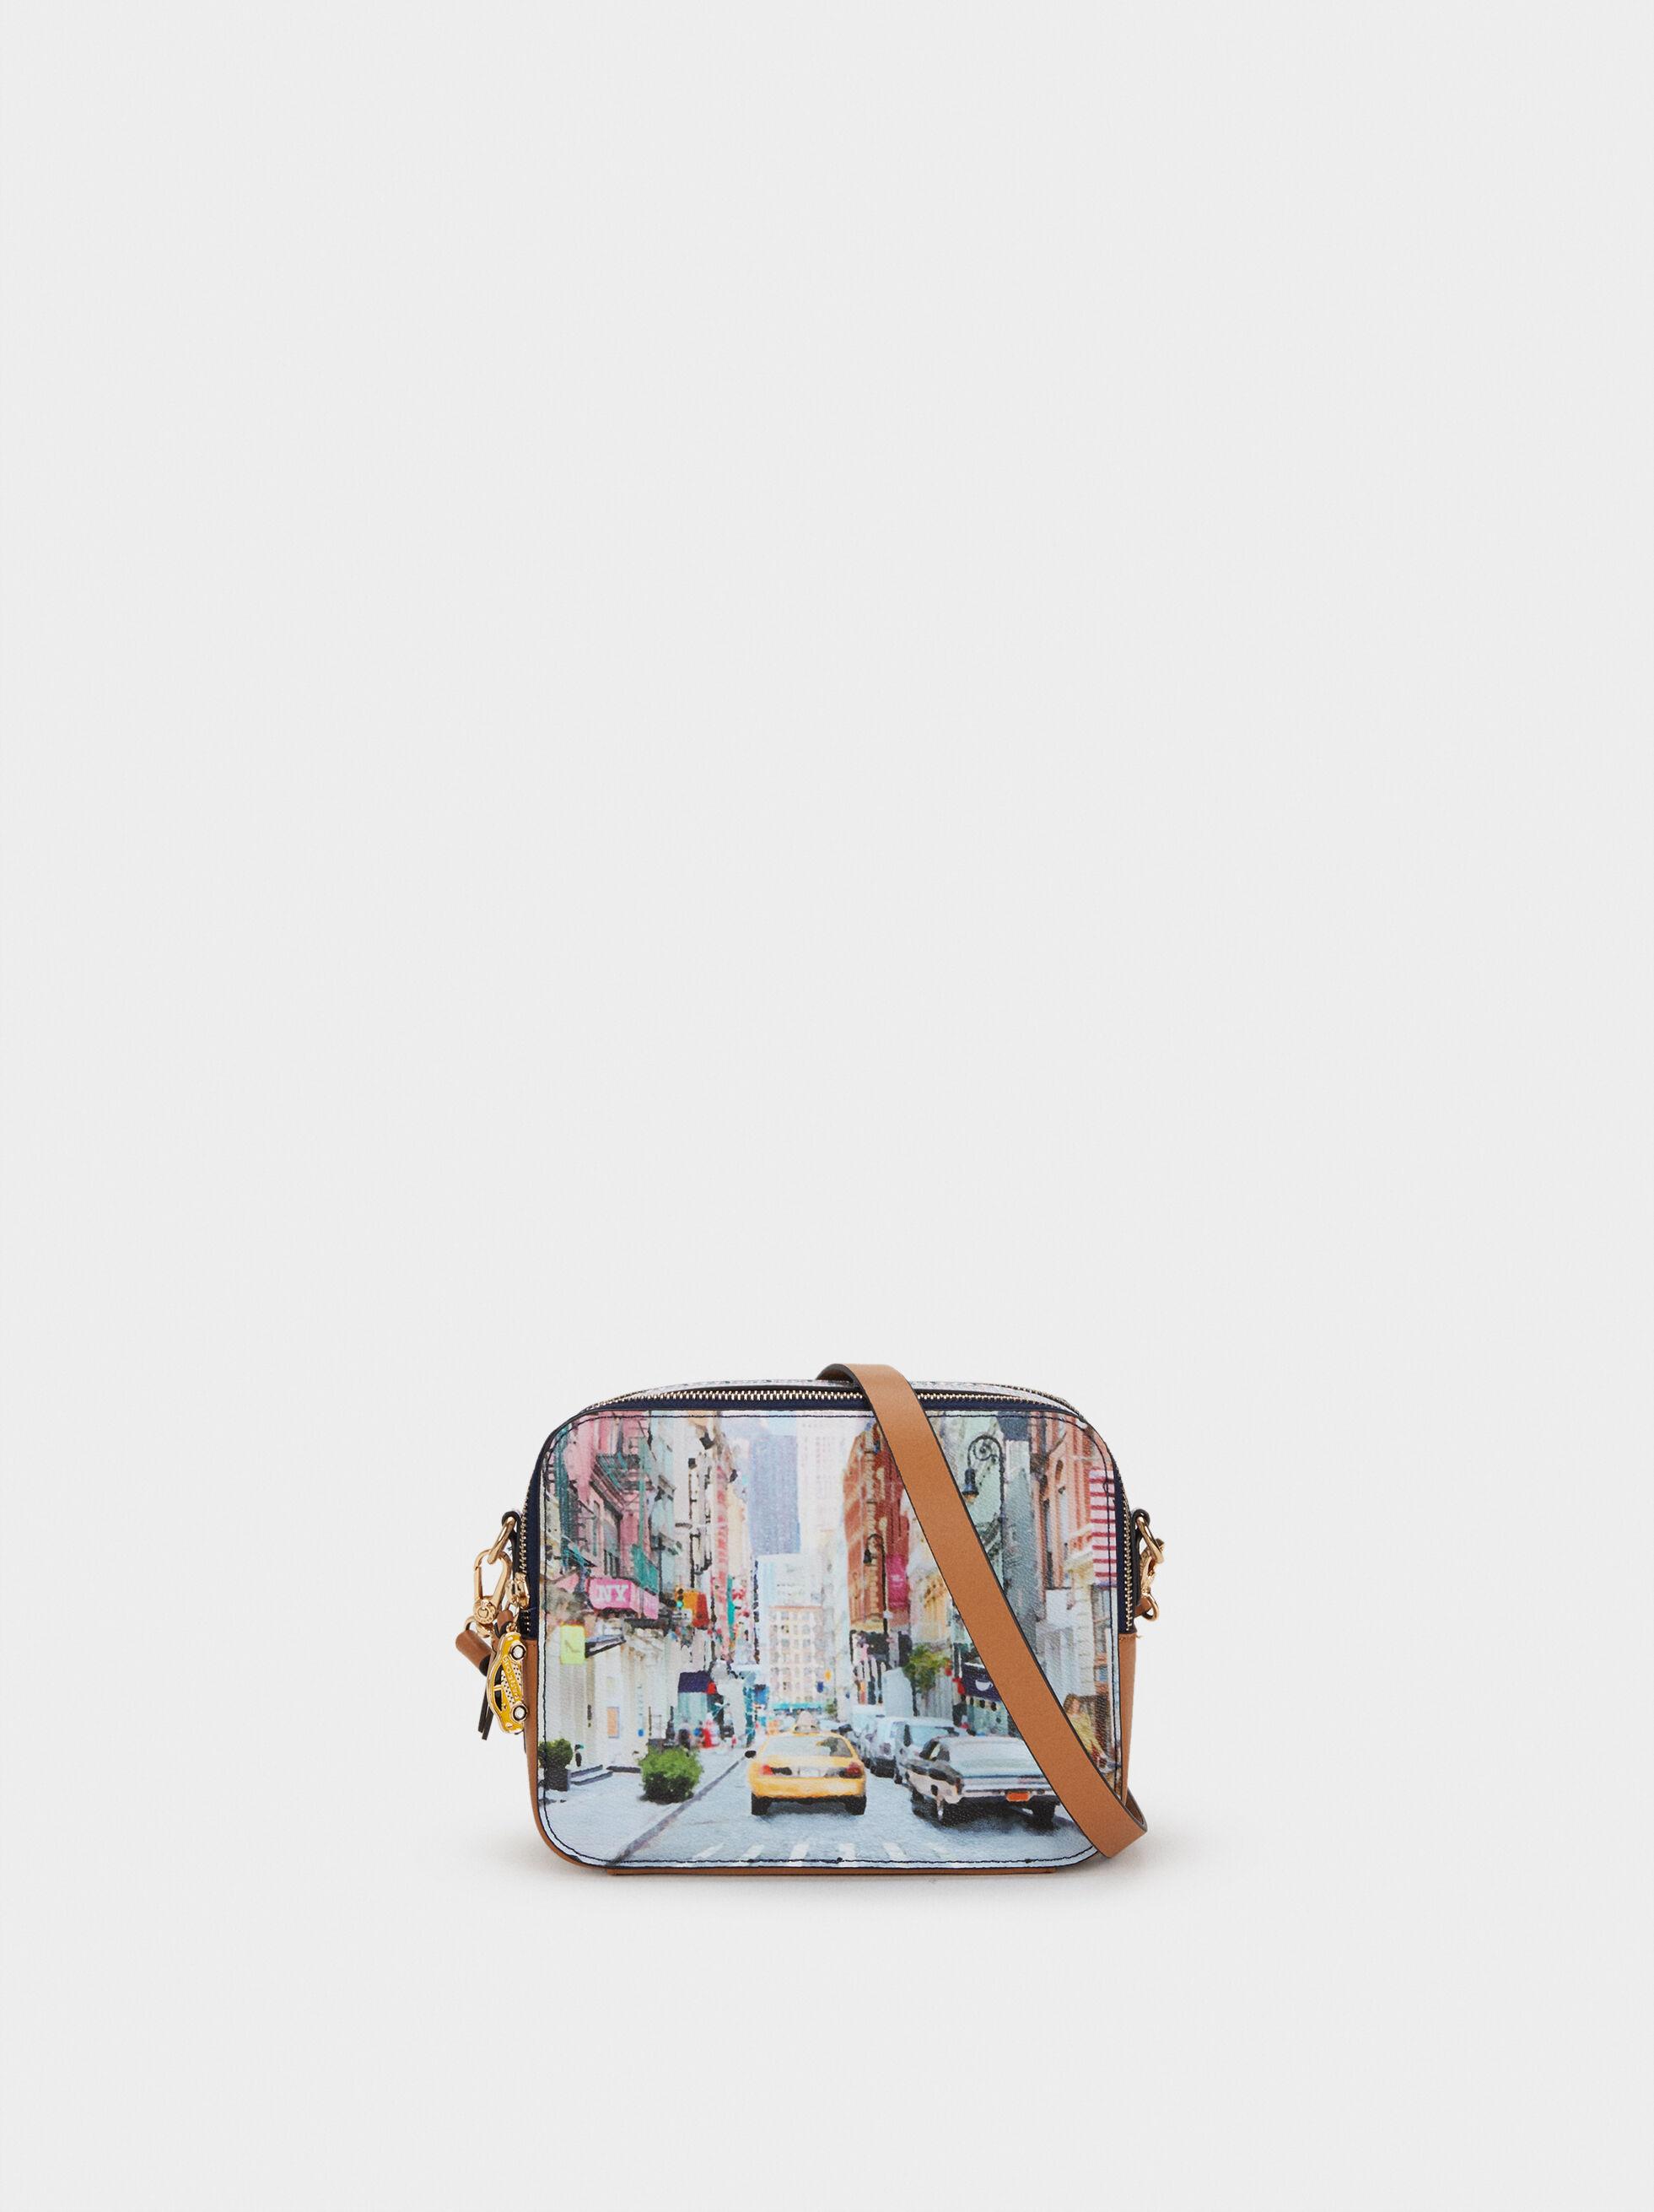 New York Print Shoulder Bag, Camel, hi-res